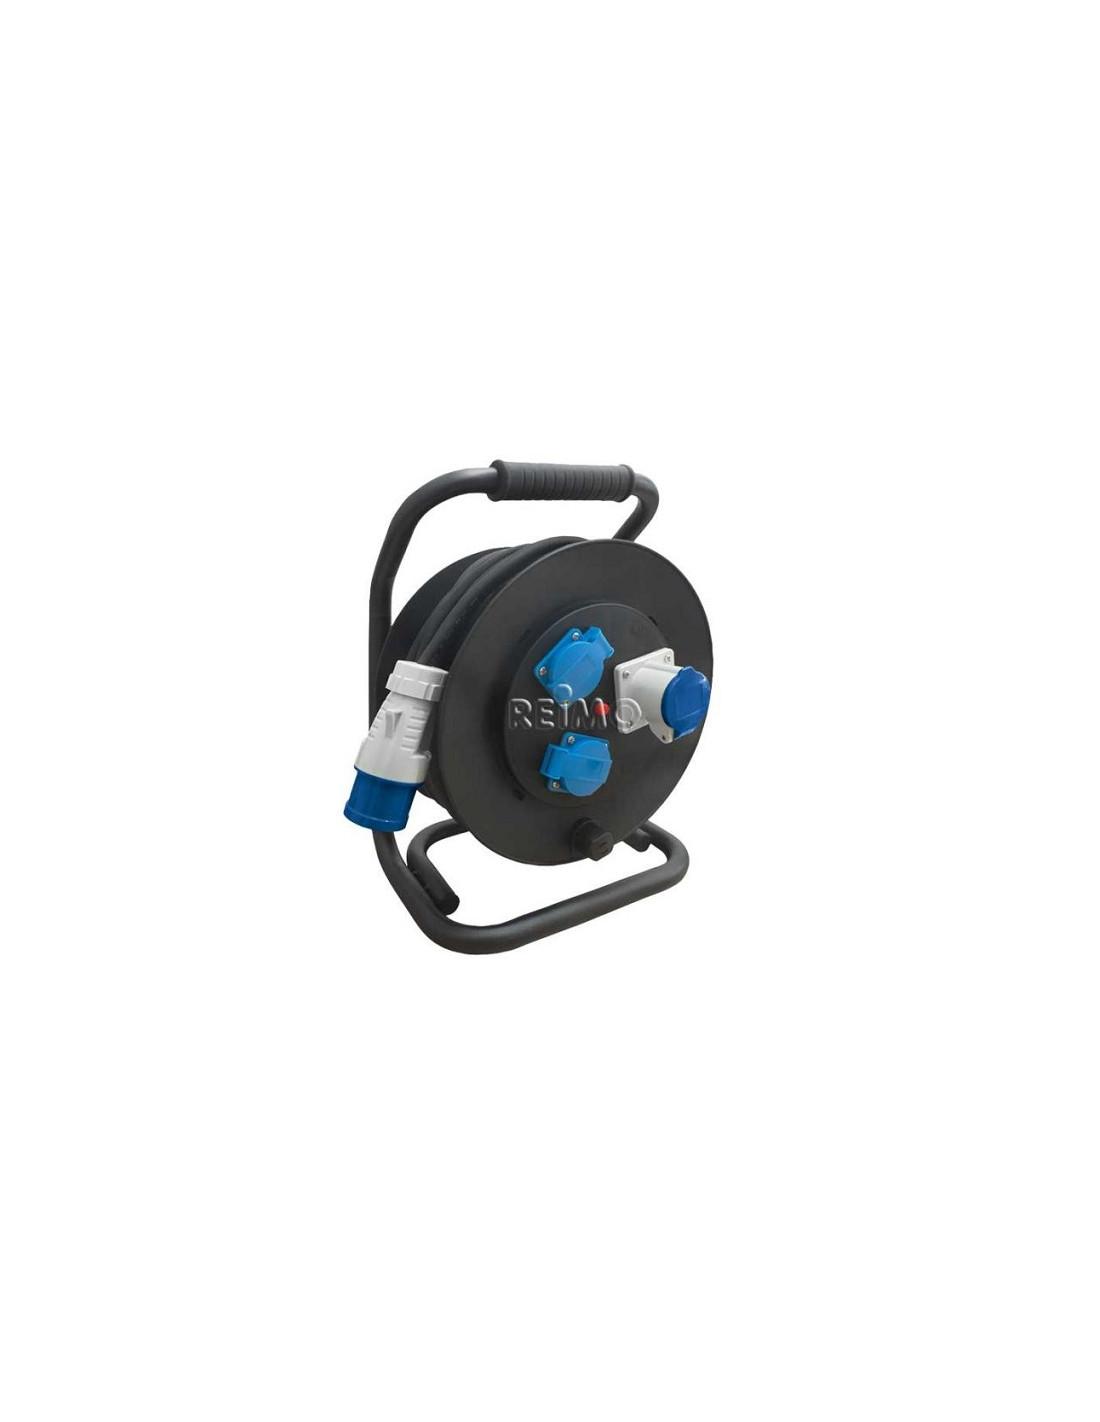 Showtec fuerte corriente alargador cee32 3x32a 415v 25 metros de cable de goma